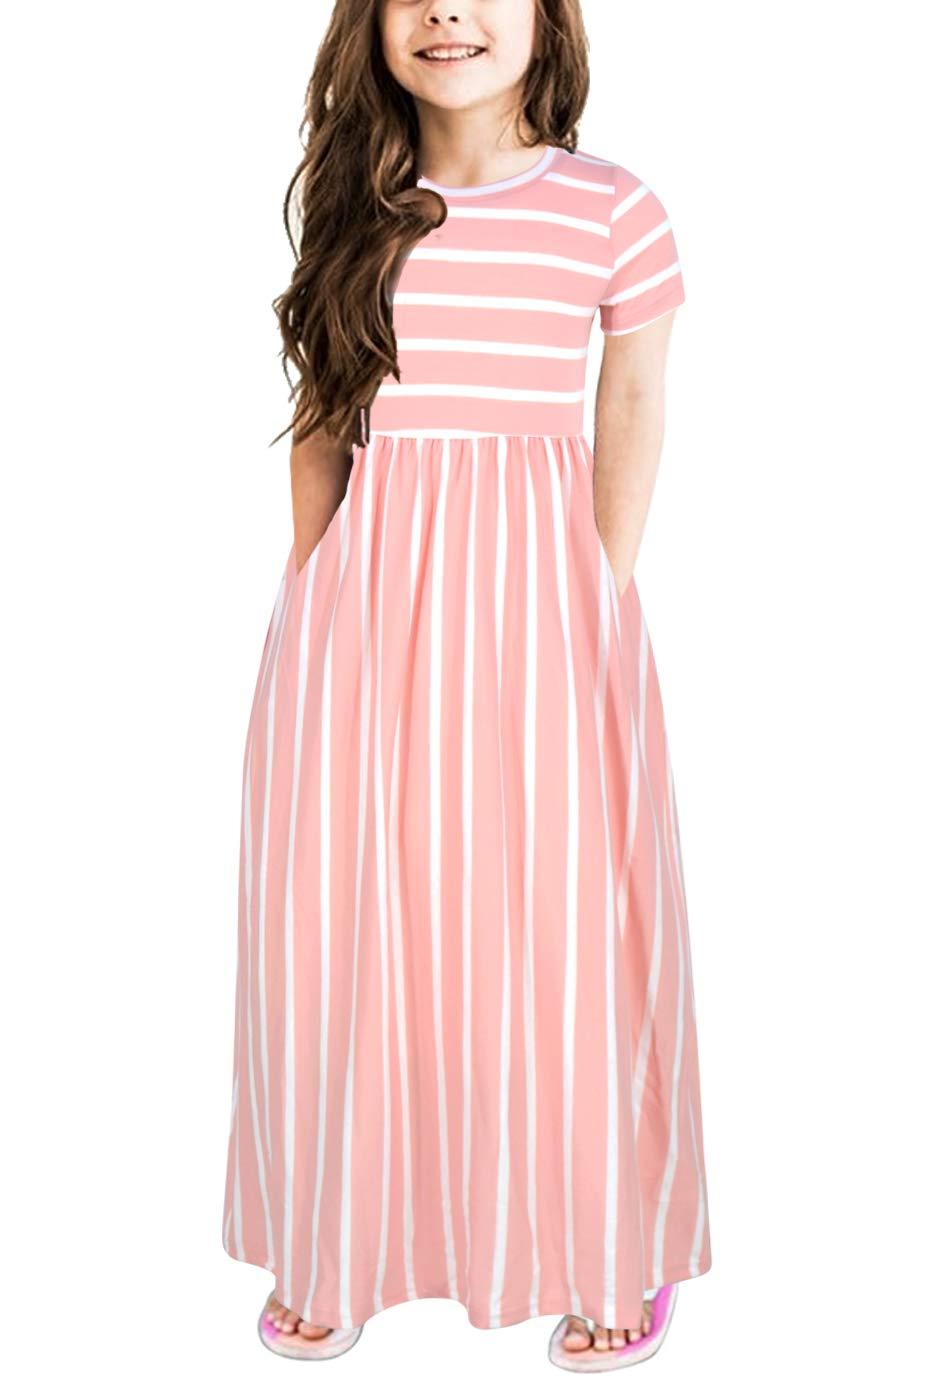 GORLYA Girls Short Sleeve Floral Print Loose Casual Holiday Long Maxi Dress with Pockets 4-12 Years